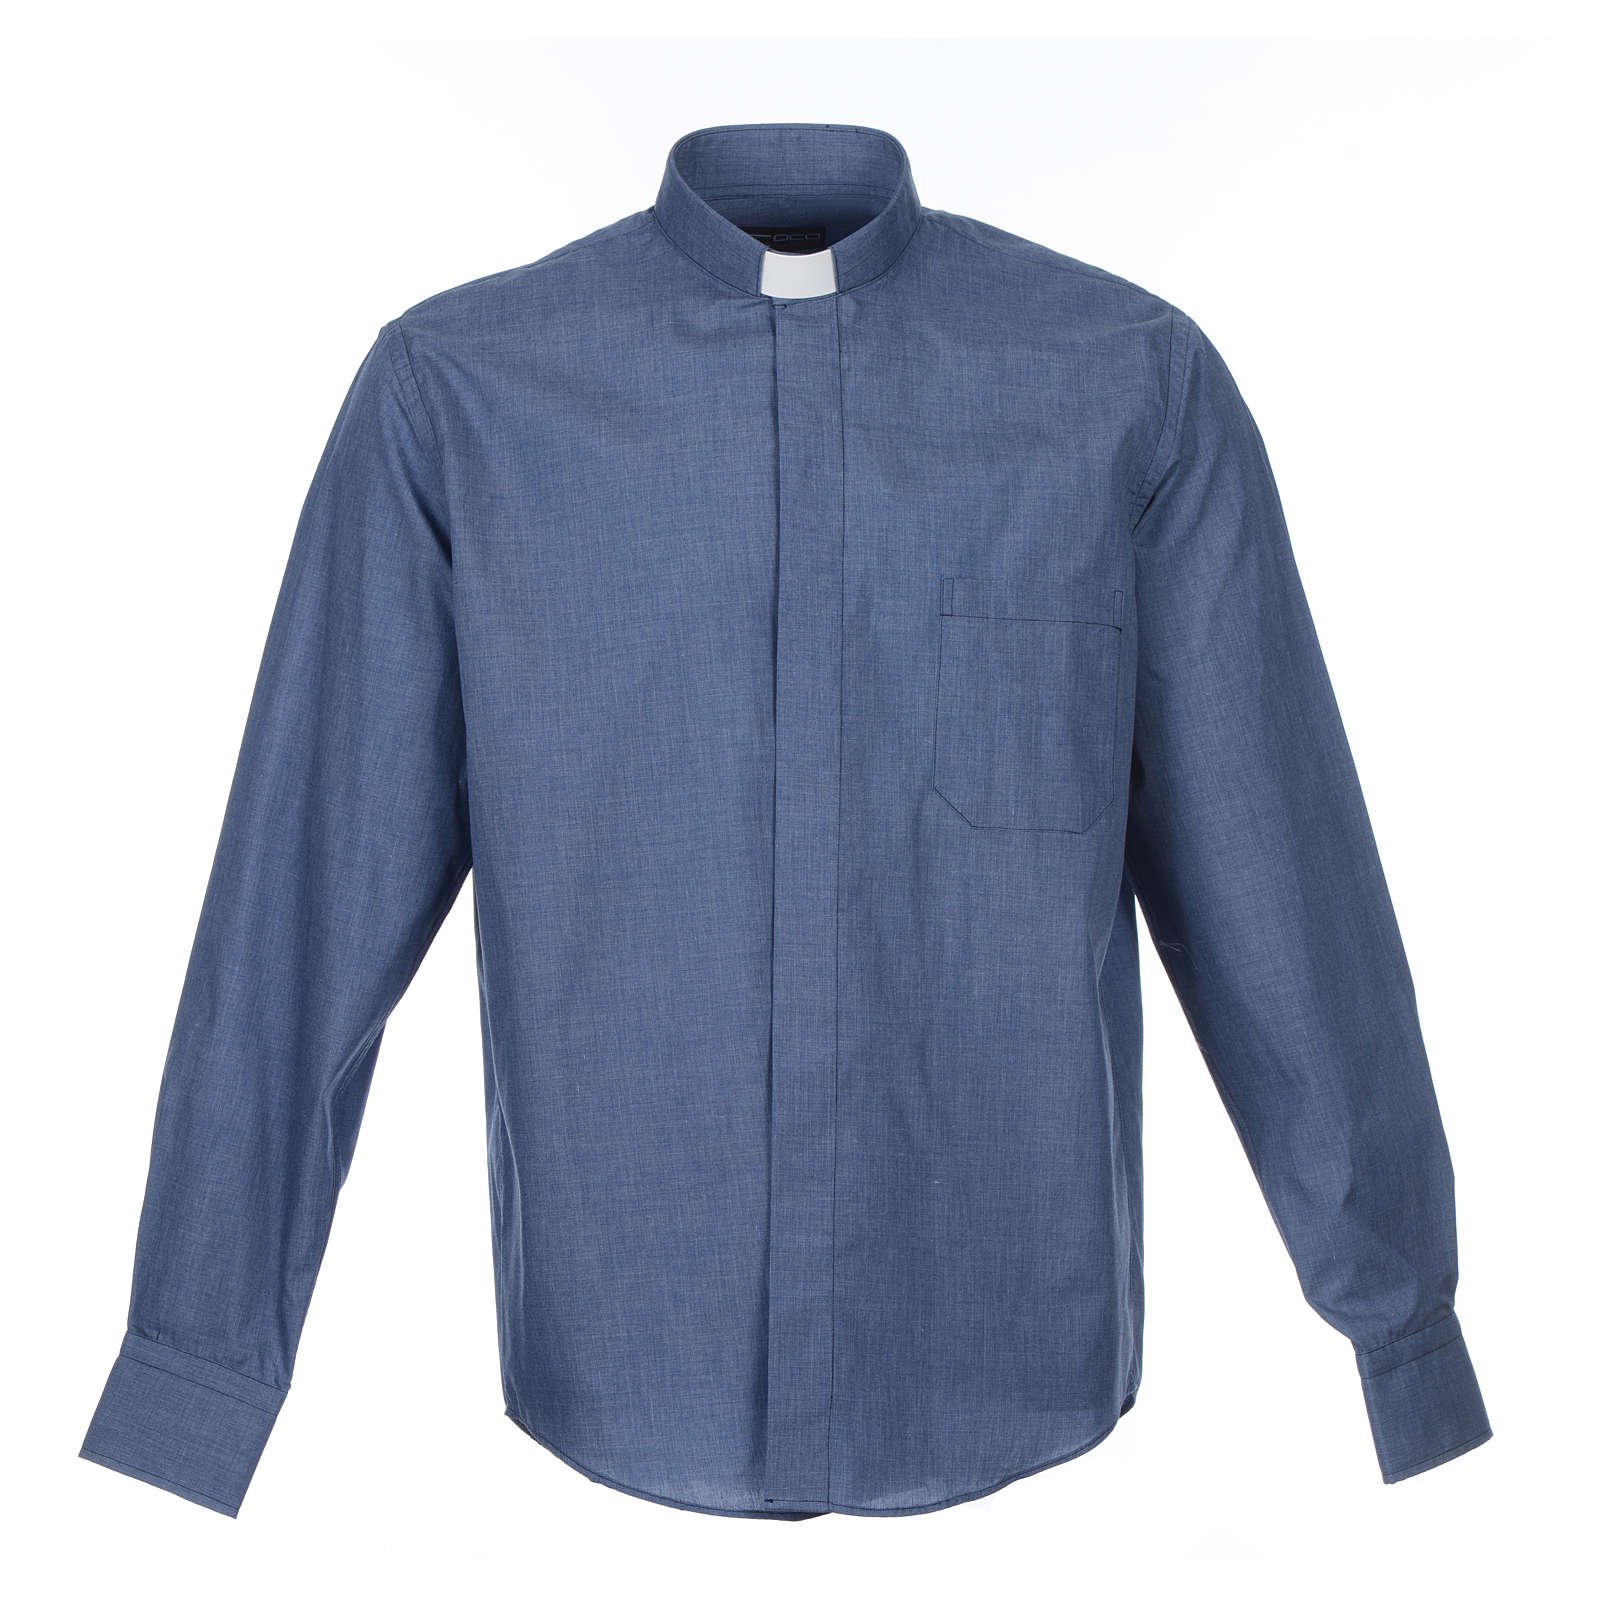 Camisa Clergy Manga Larga Color Uniforme Mixto Algodón Color Jeans 4